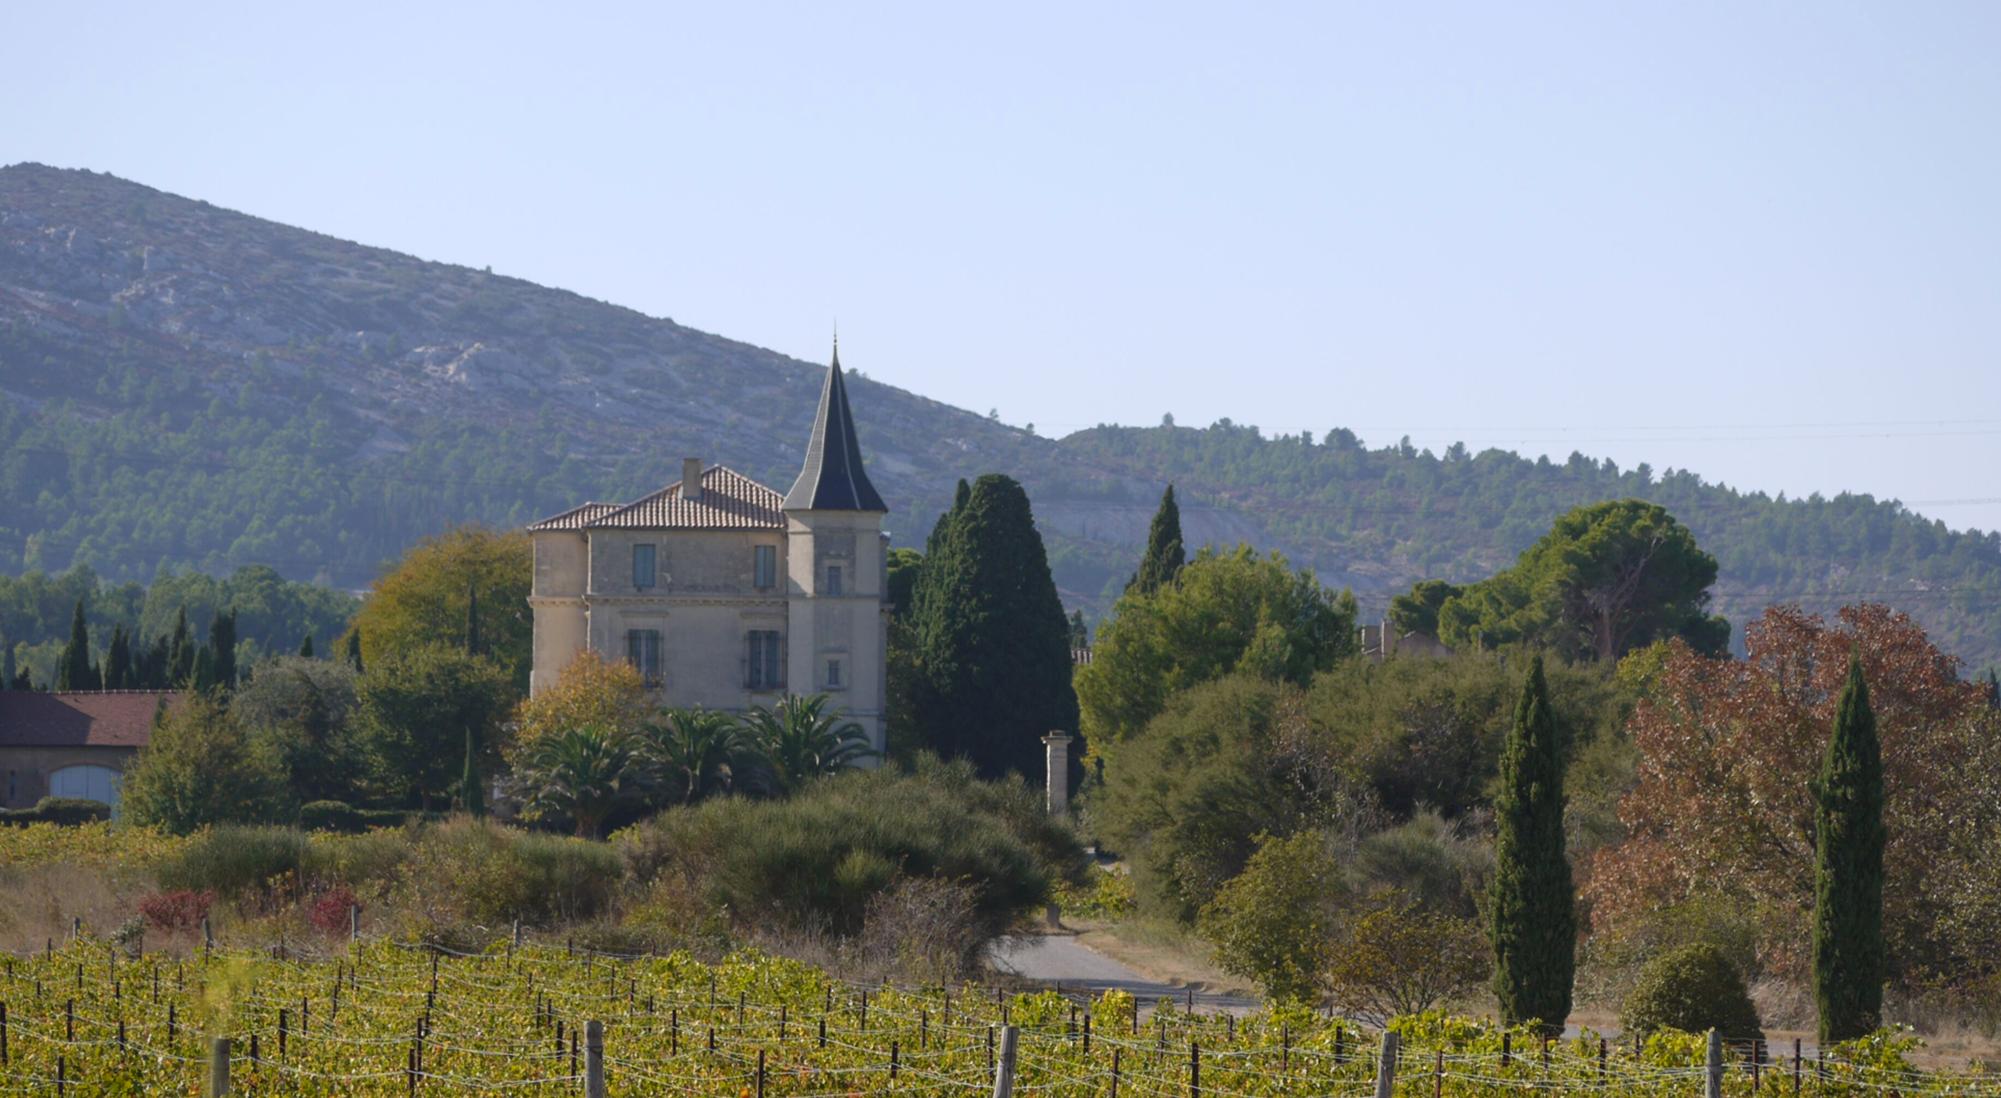 Chateau la Baronne copy.png